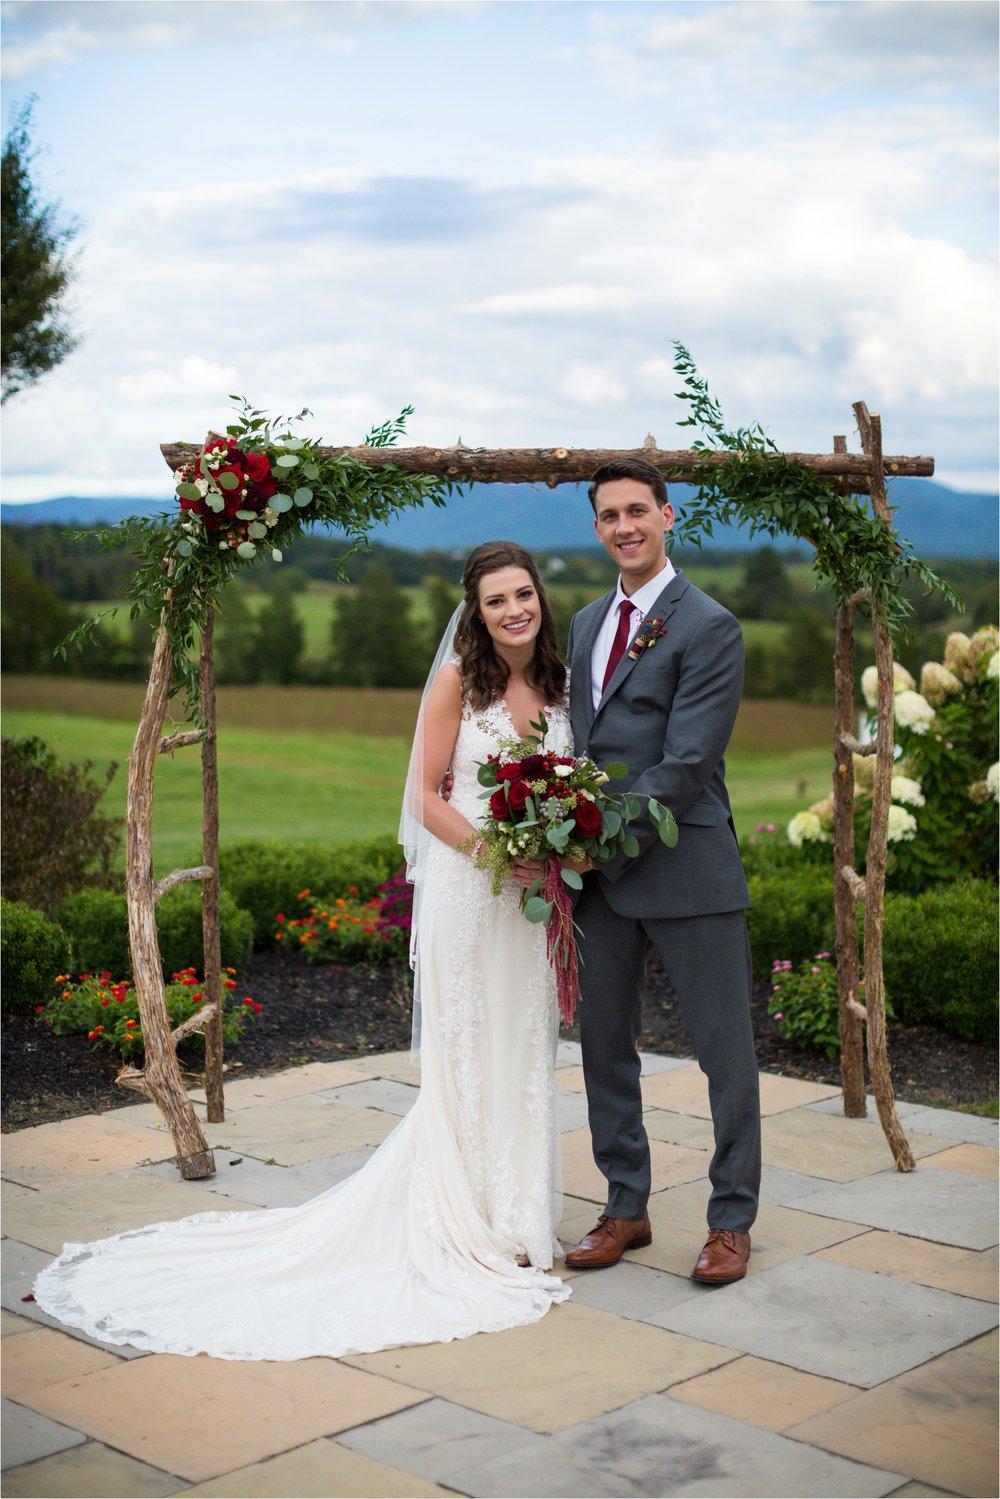 Feather-and-Oak-Photography-Cross-Keys-Vineyard-Wedding-1121.jpg